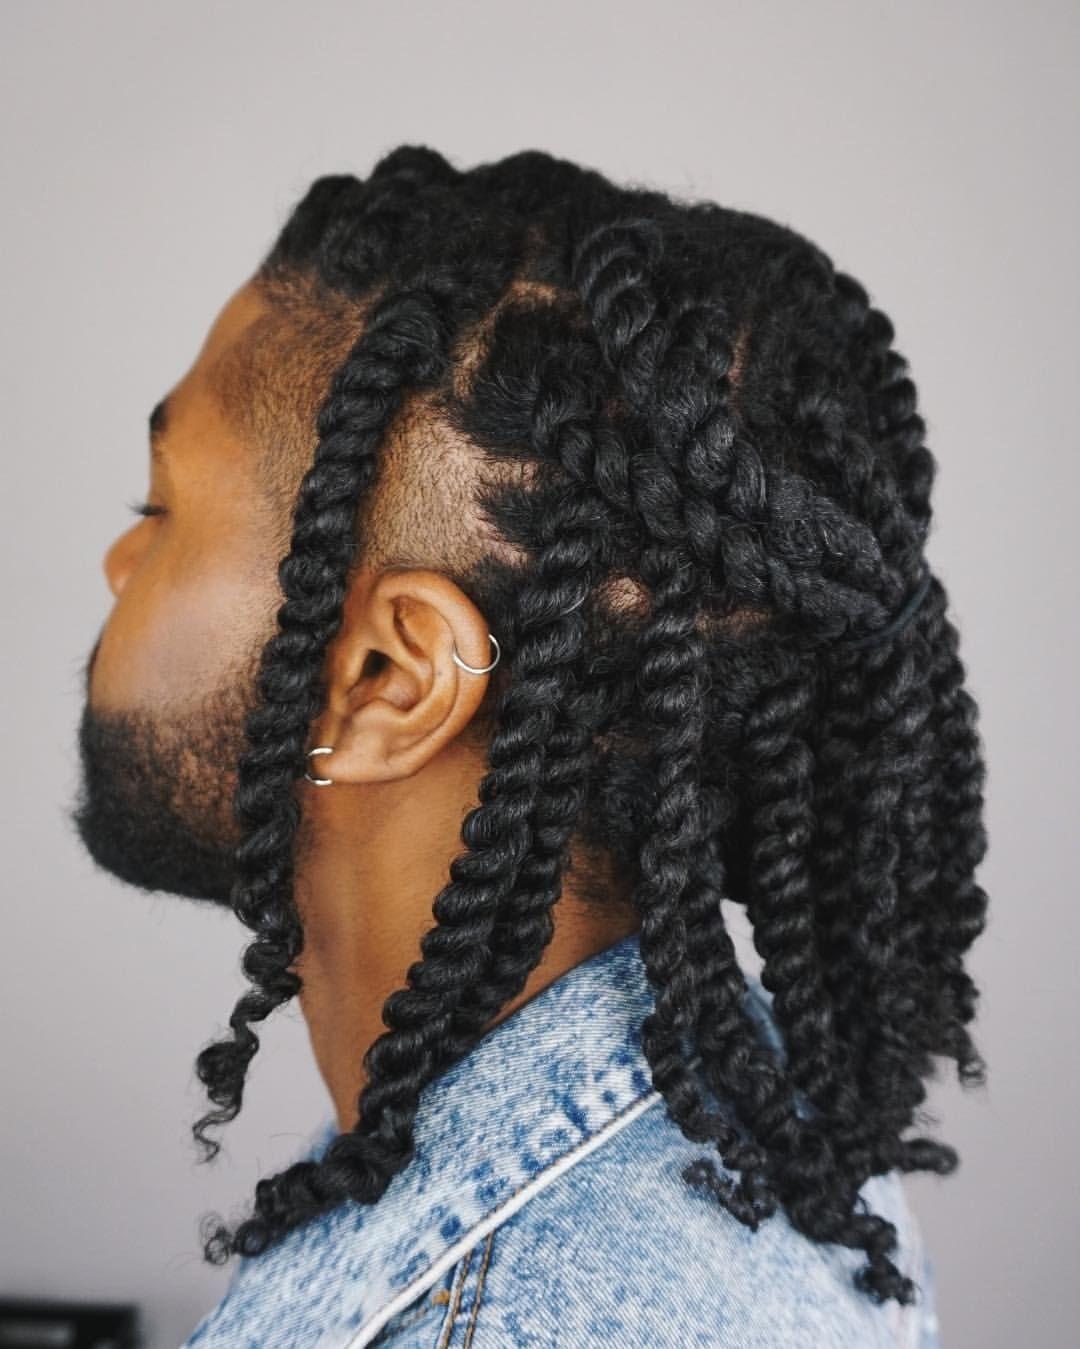 Pin By J V On M I S C Mens Braids Hairstyles Hair Twist Styles